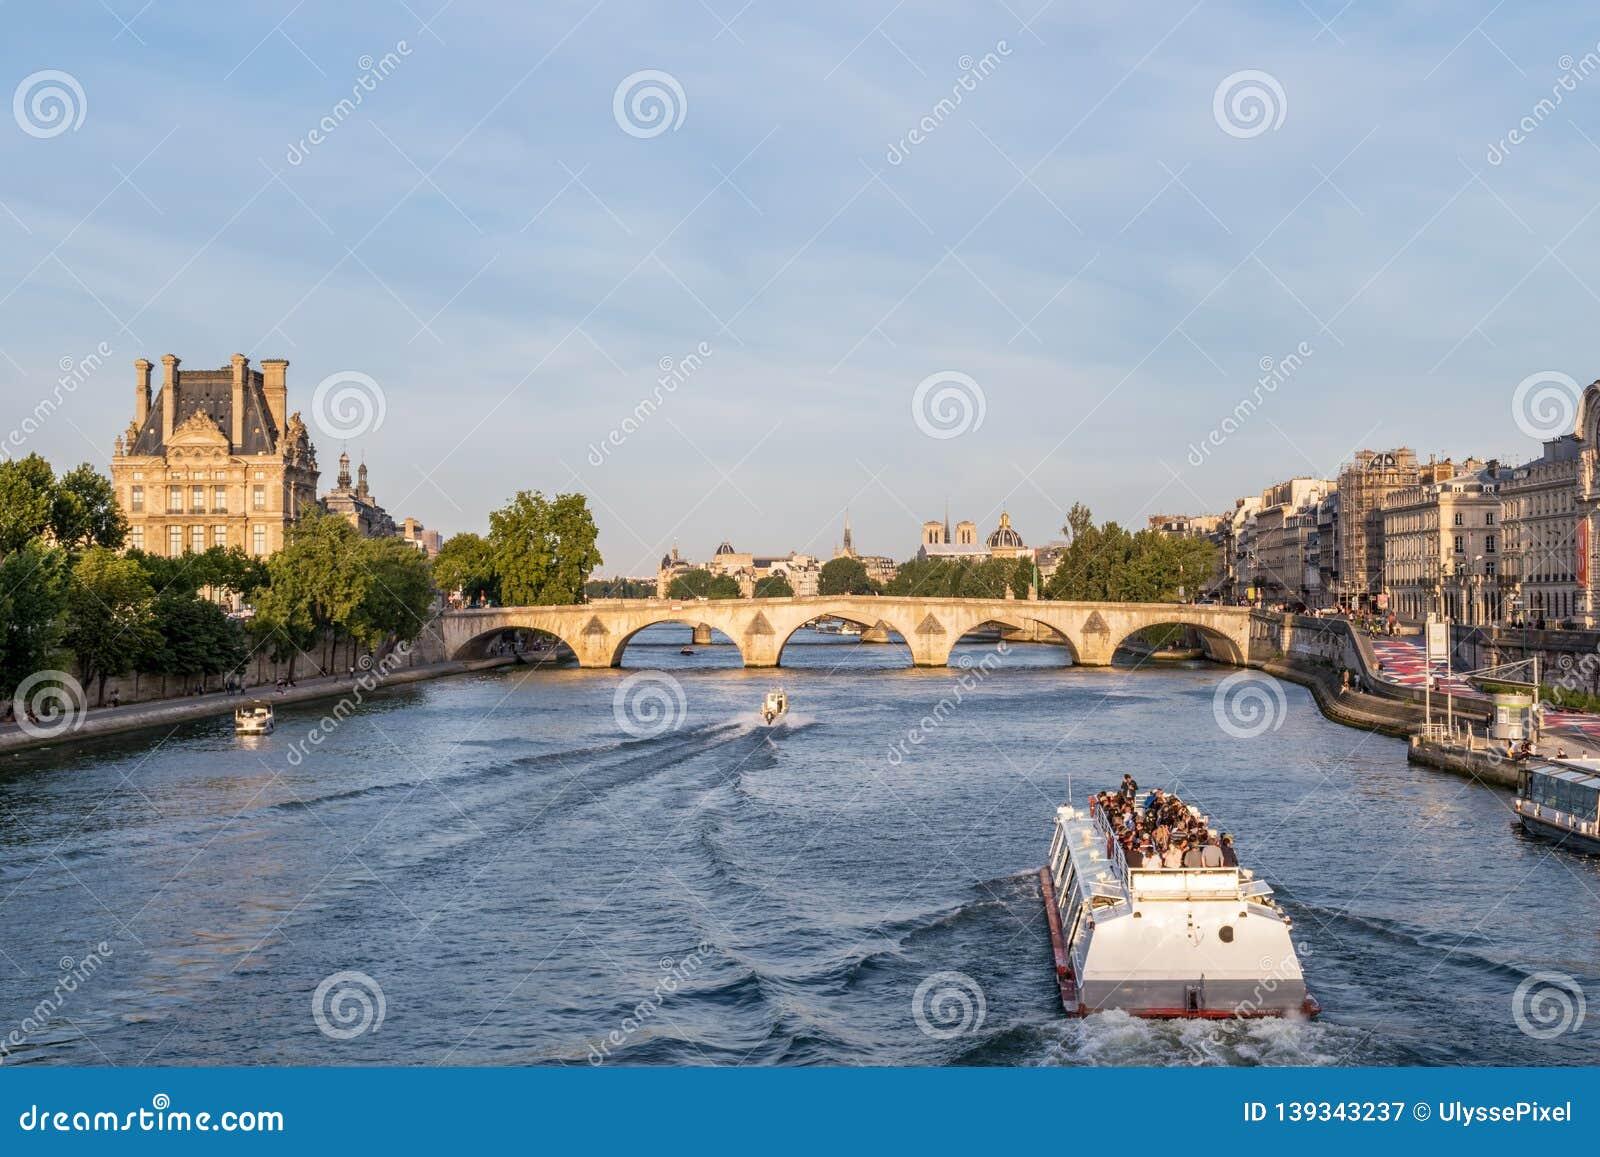 Pont Royal Over The Seine River Paris France Editorial